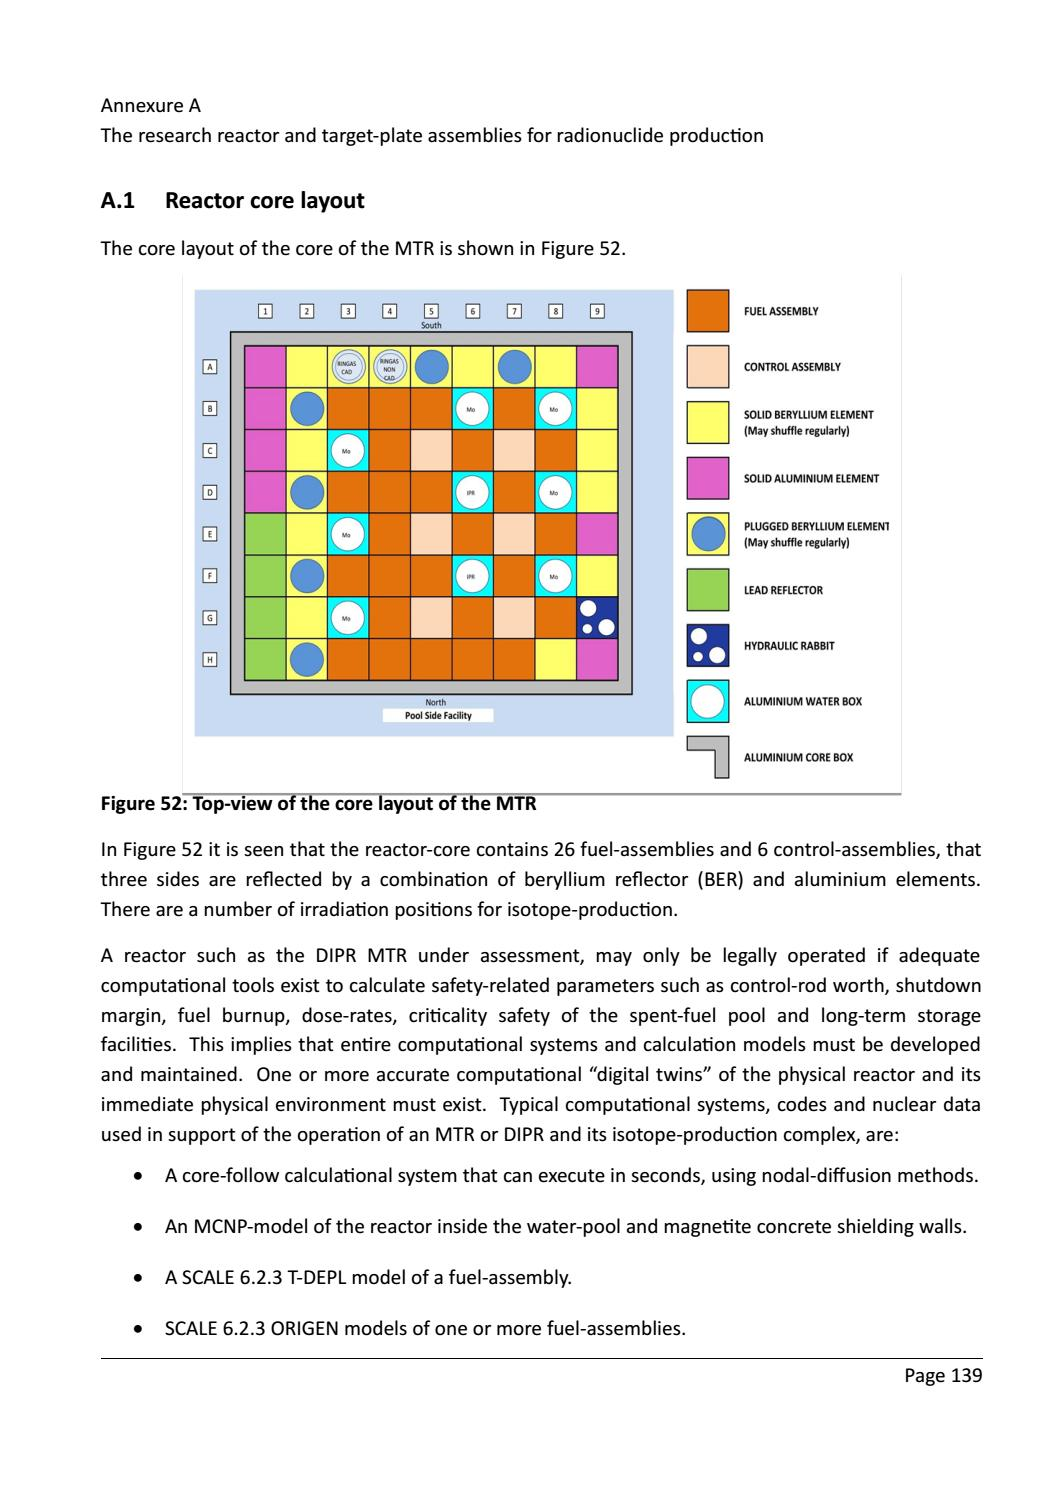 RADIOACTIVE WASTE: COMPUTATIONAL CHARACTERISATION and SHIELDING page 164